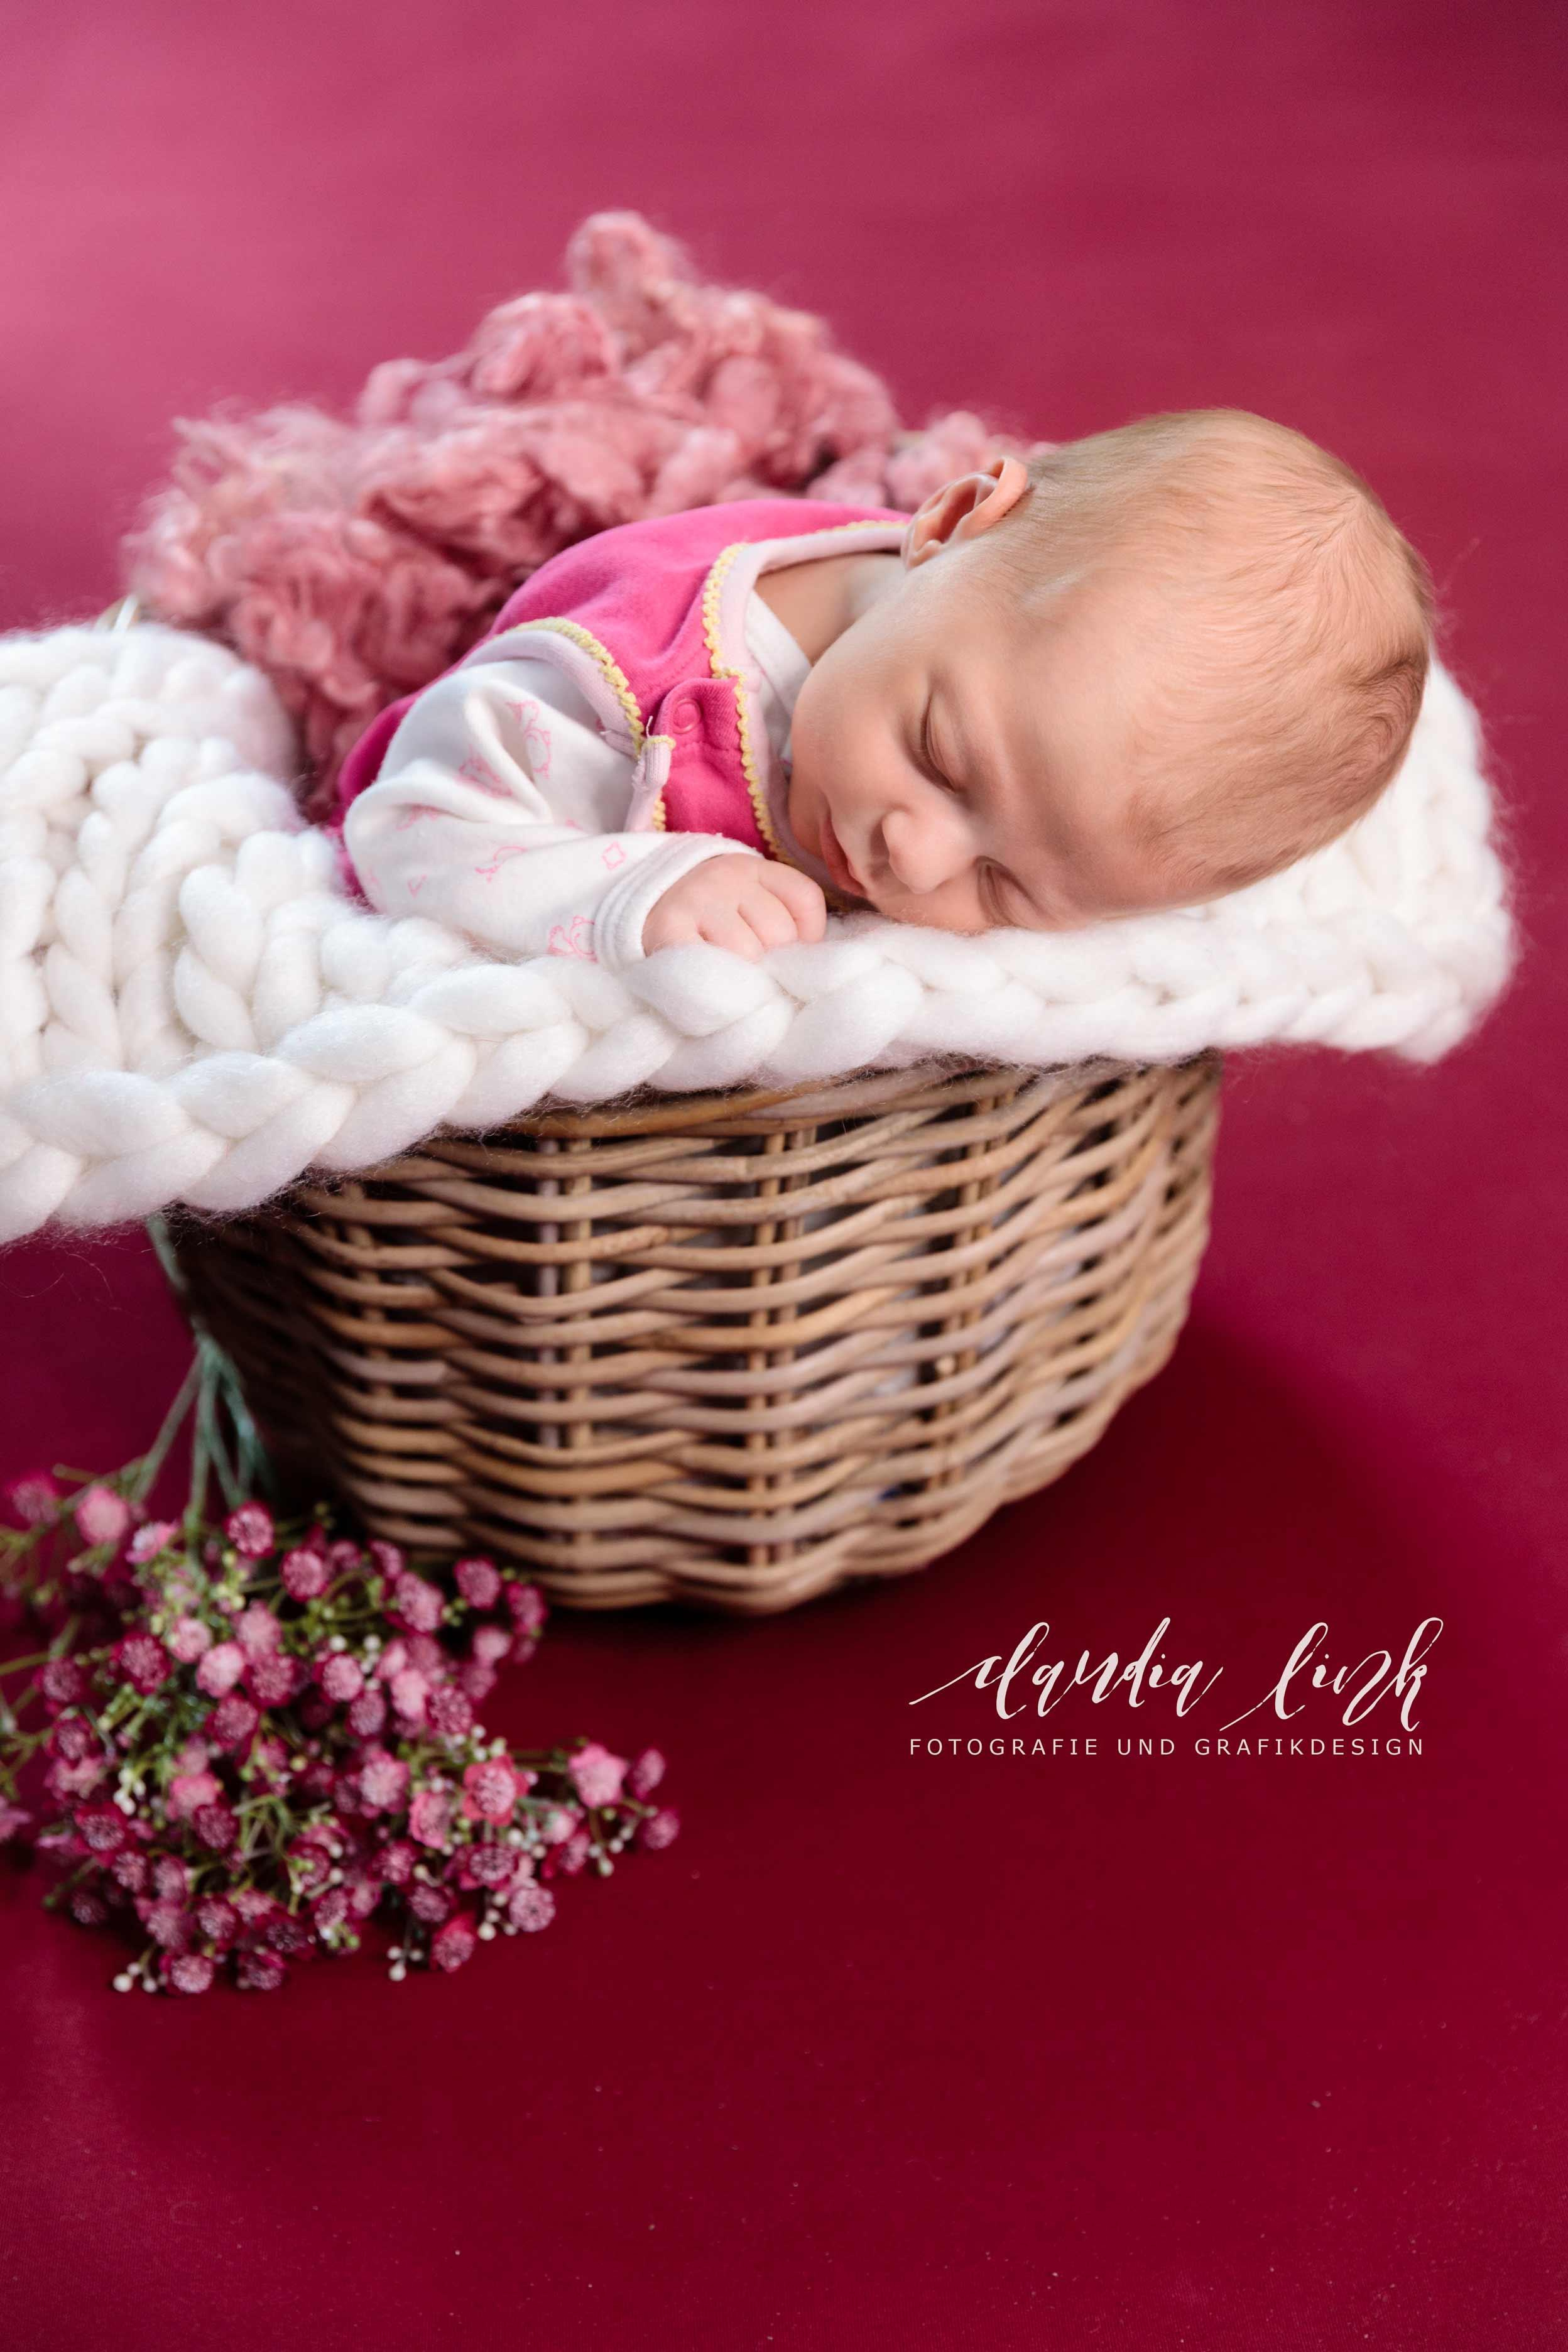 Newbornshooting in verträumten Farben IMG 8371w